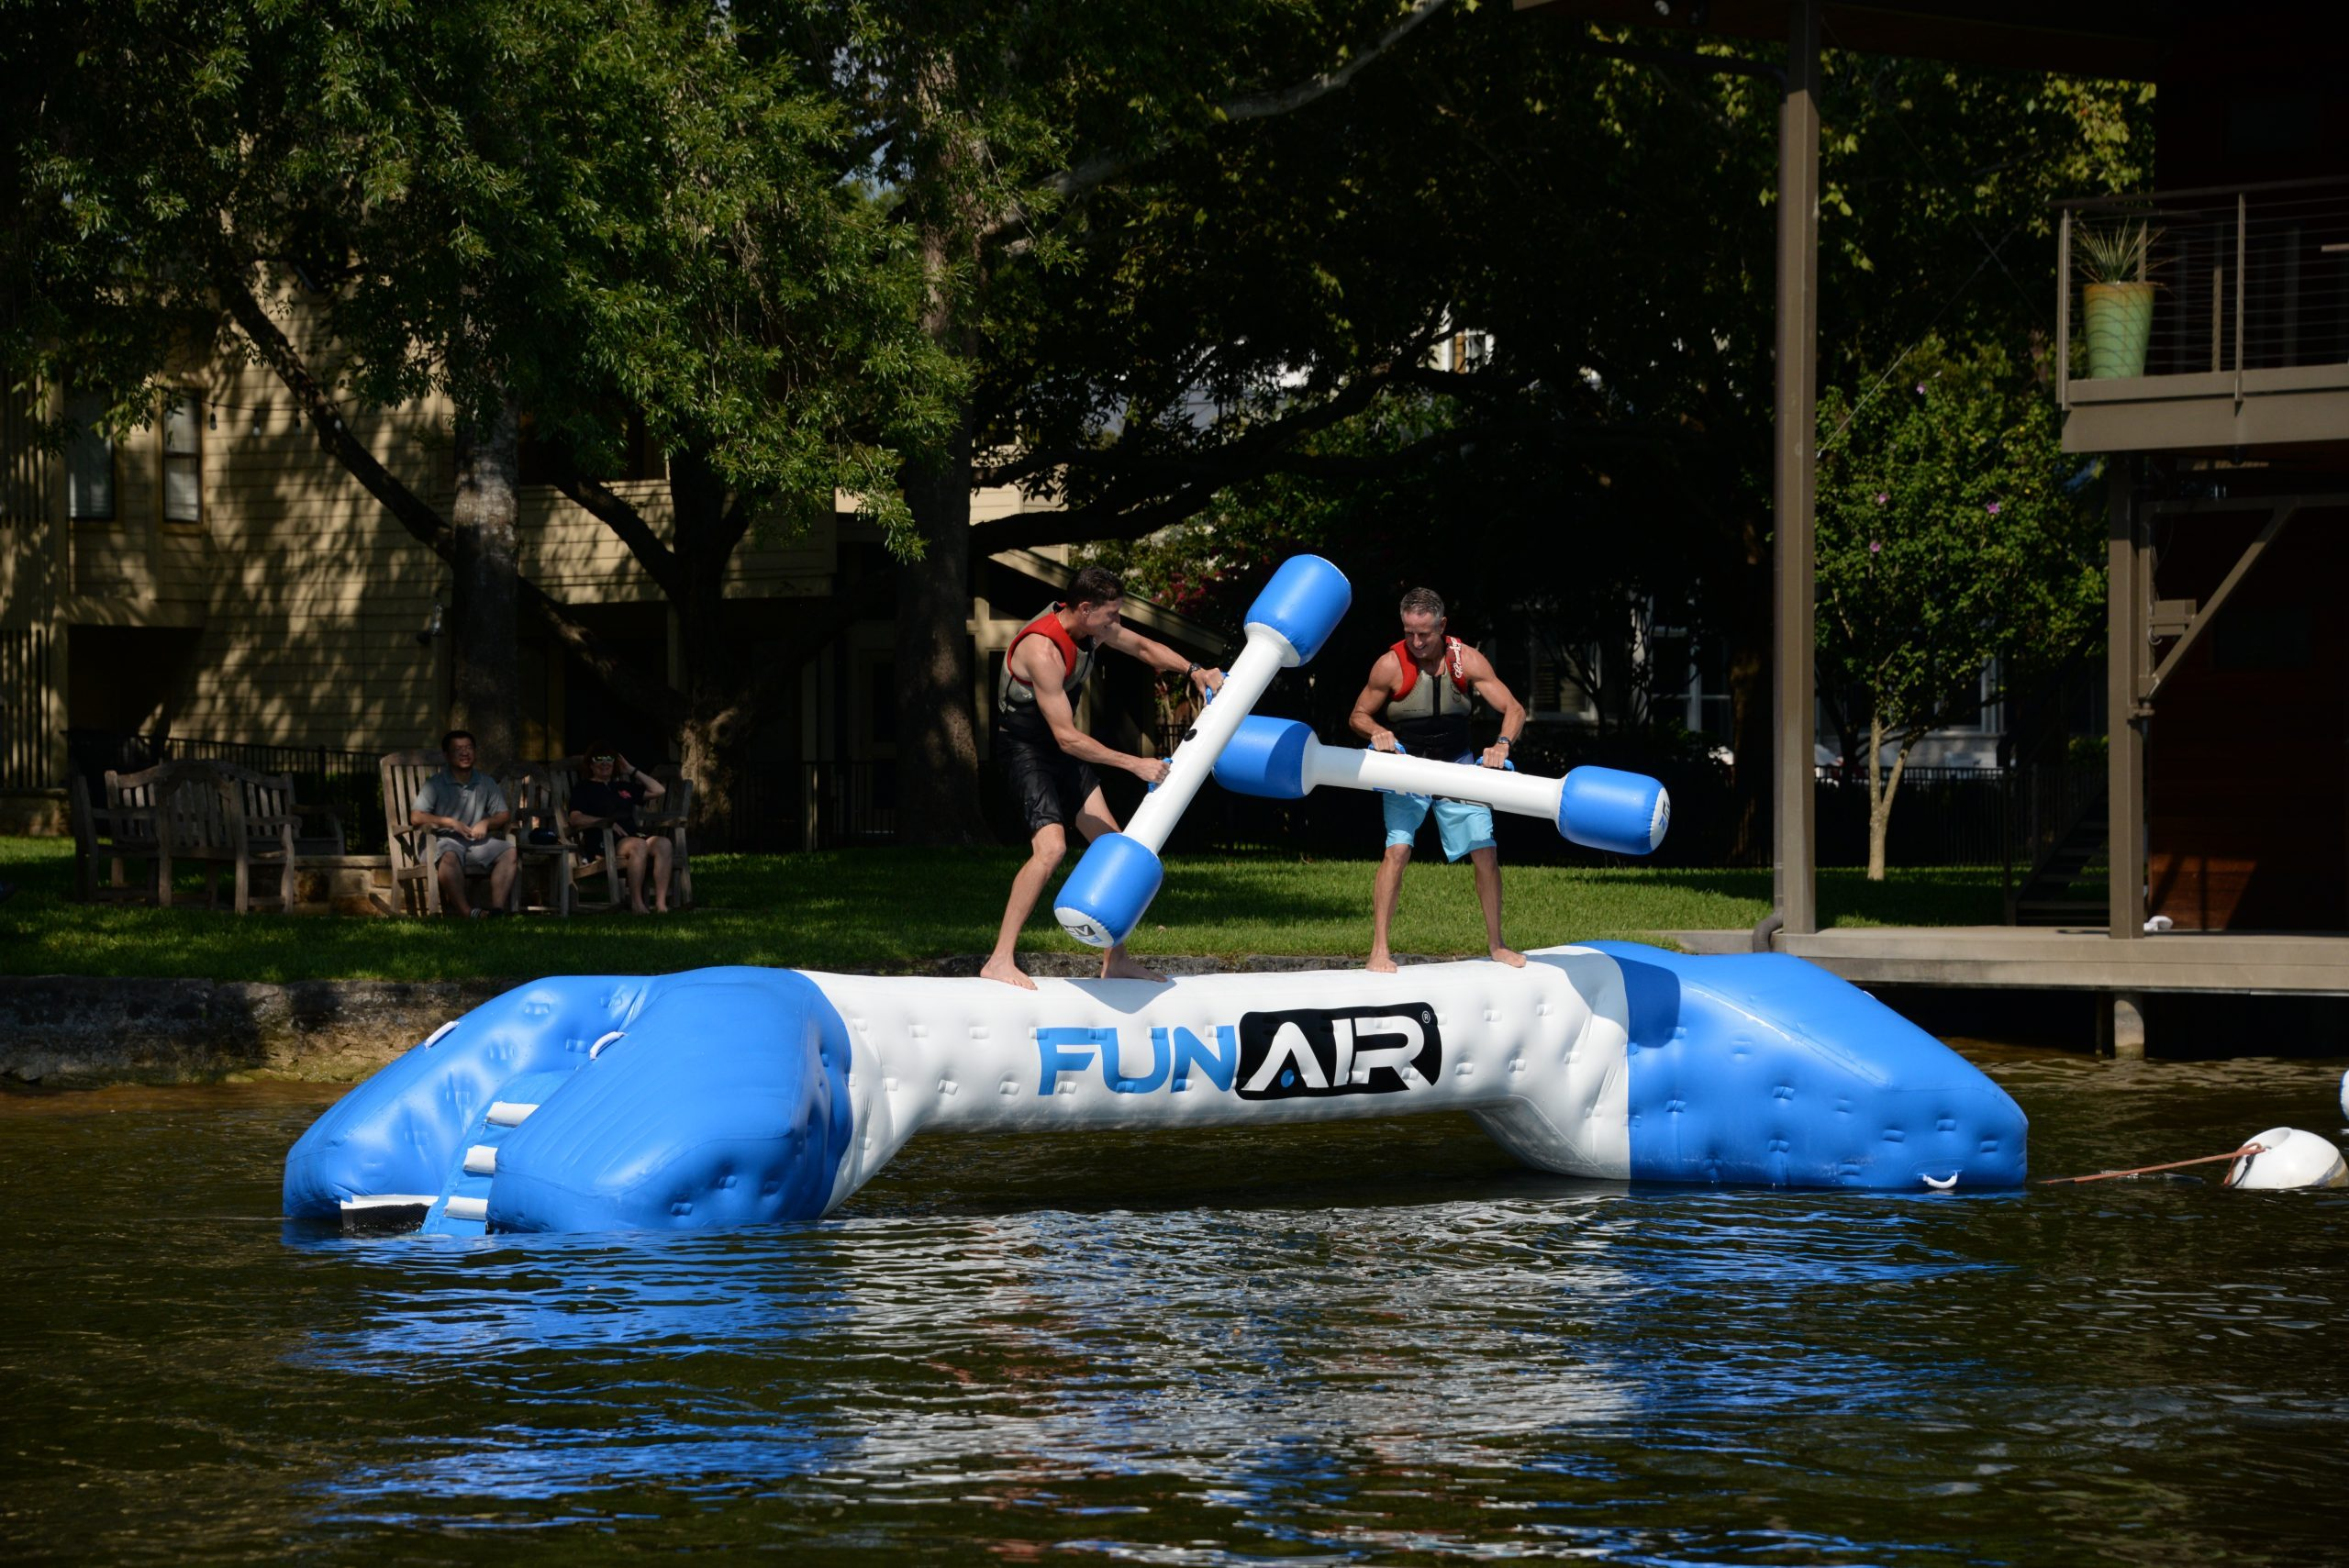 FunAir Yacht Joust challenge